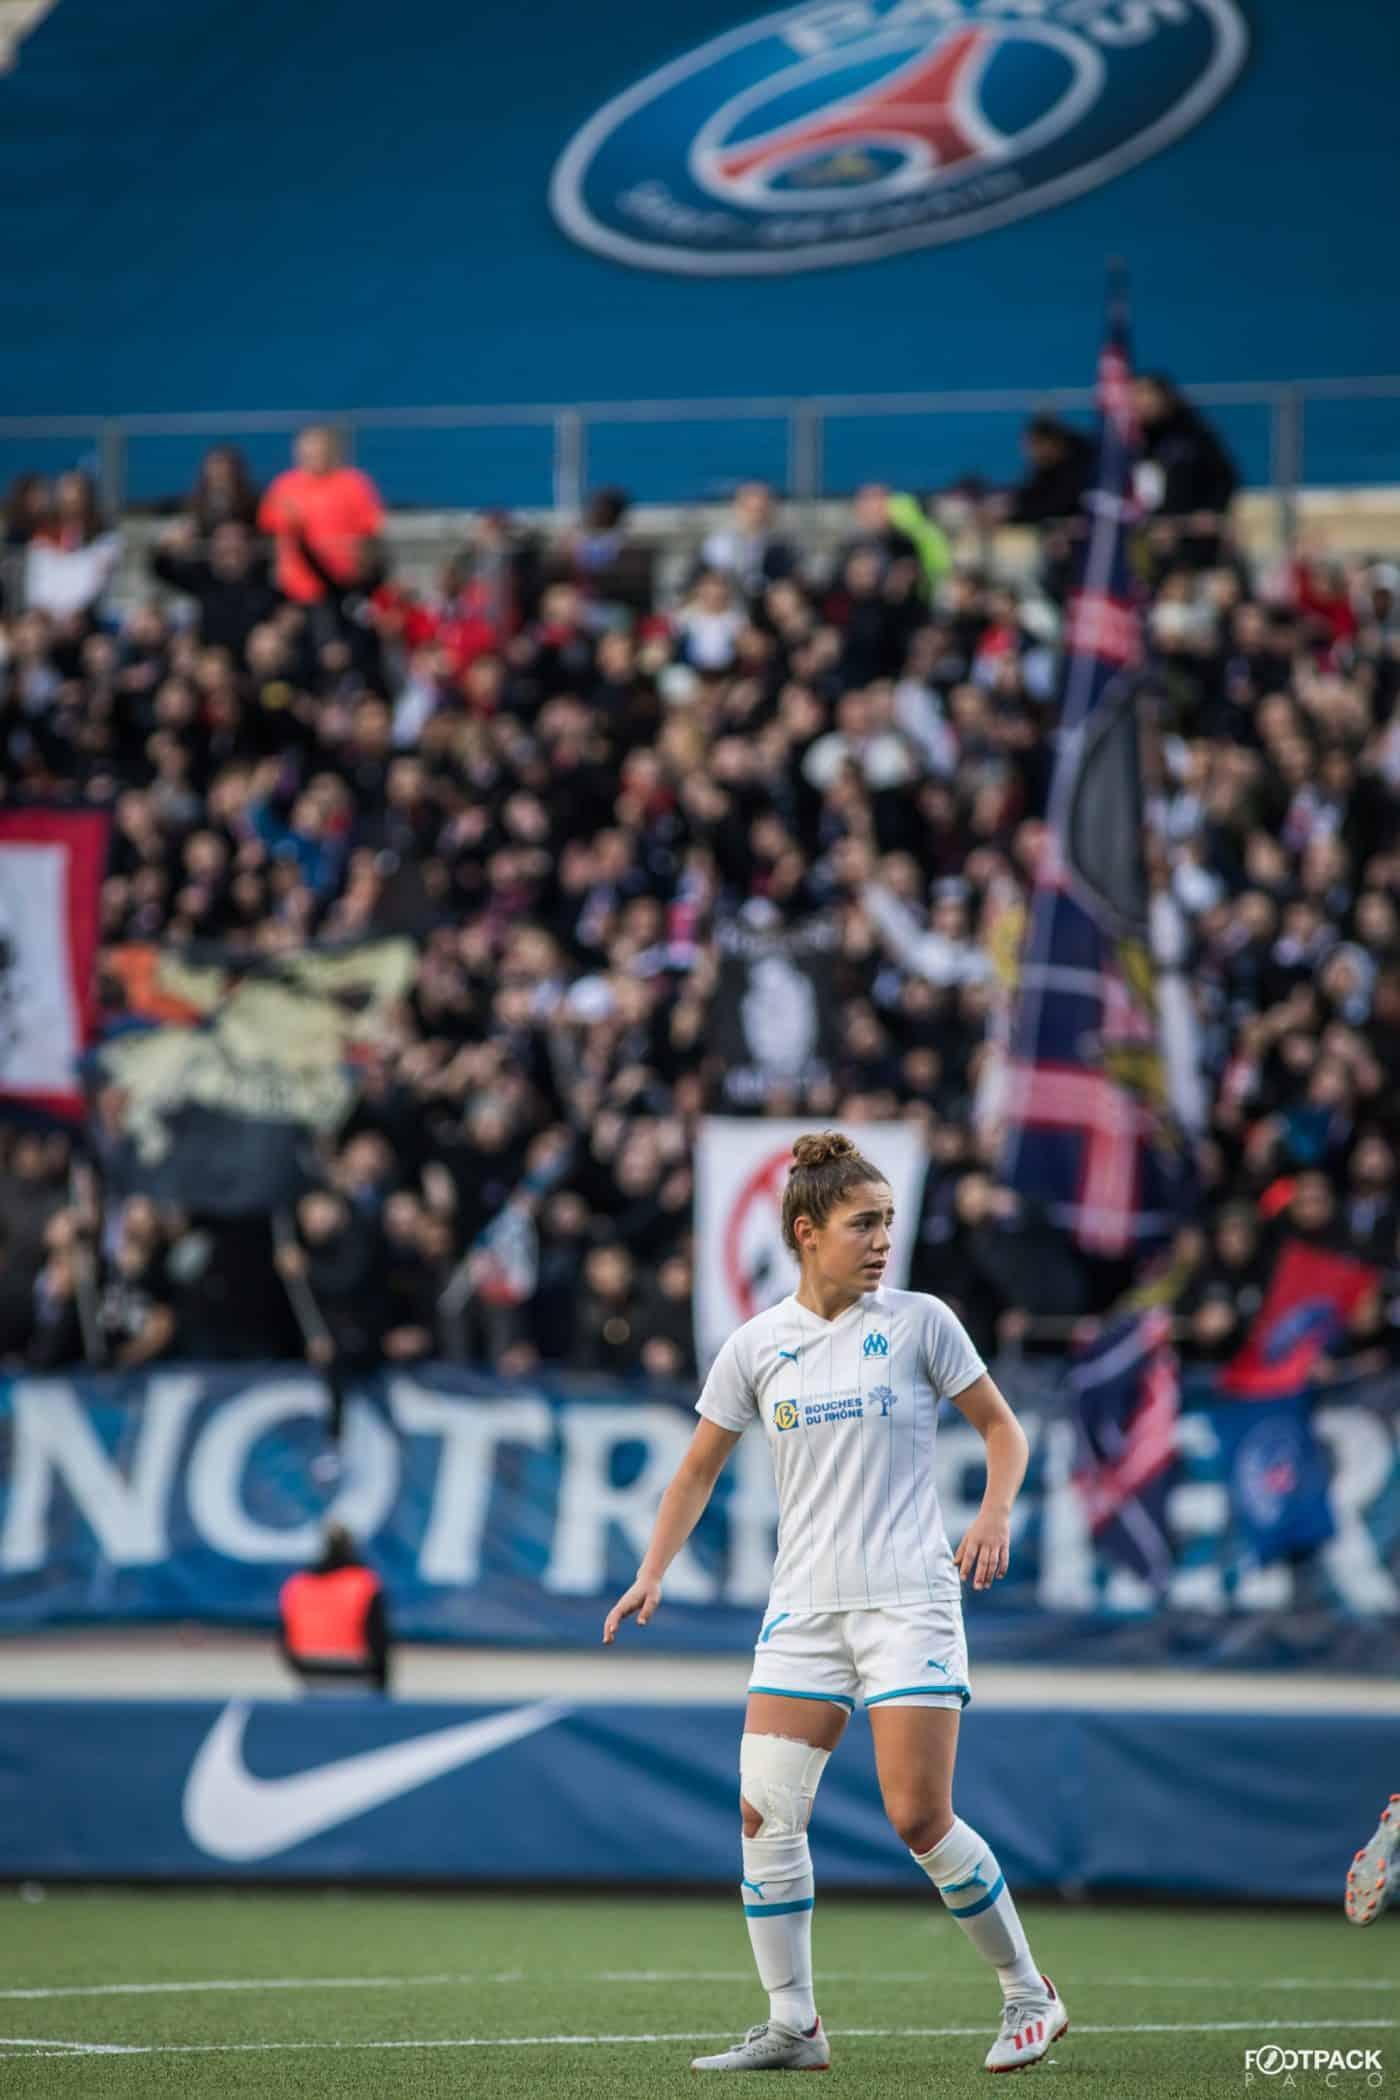 au-stade-paris-saint-germain-psg-olympique-de-marseille-d1-feminine-arkema-footpack-15